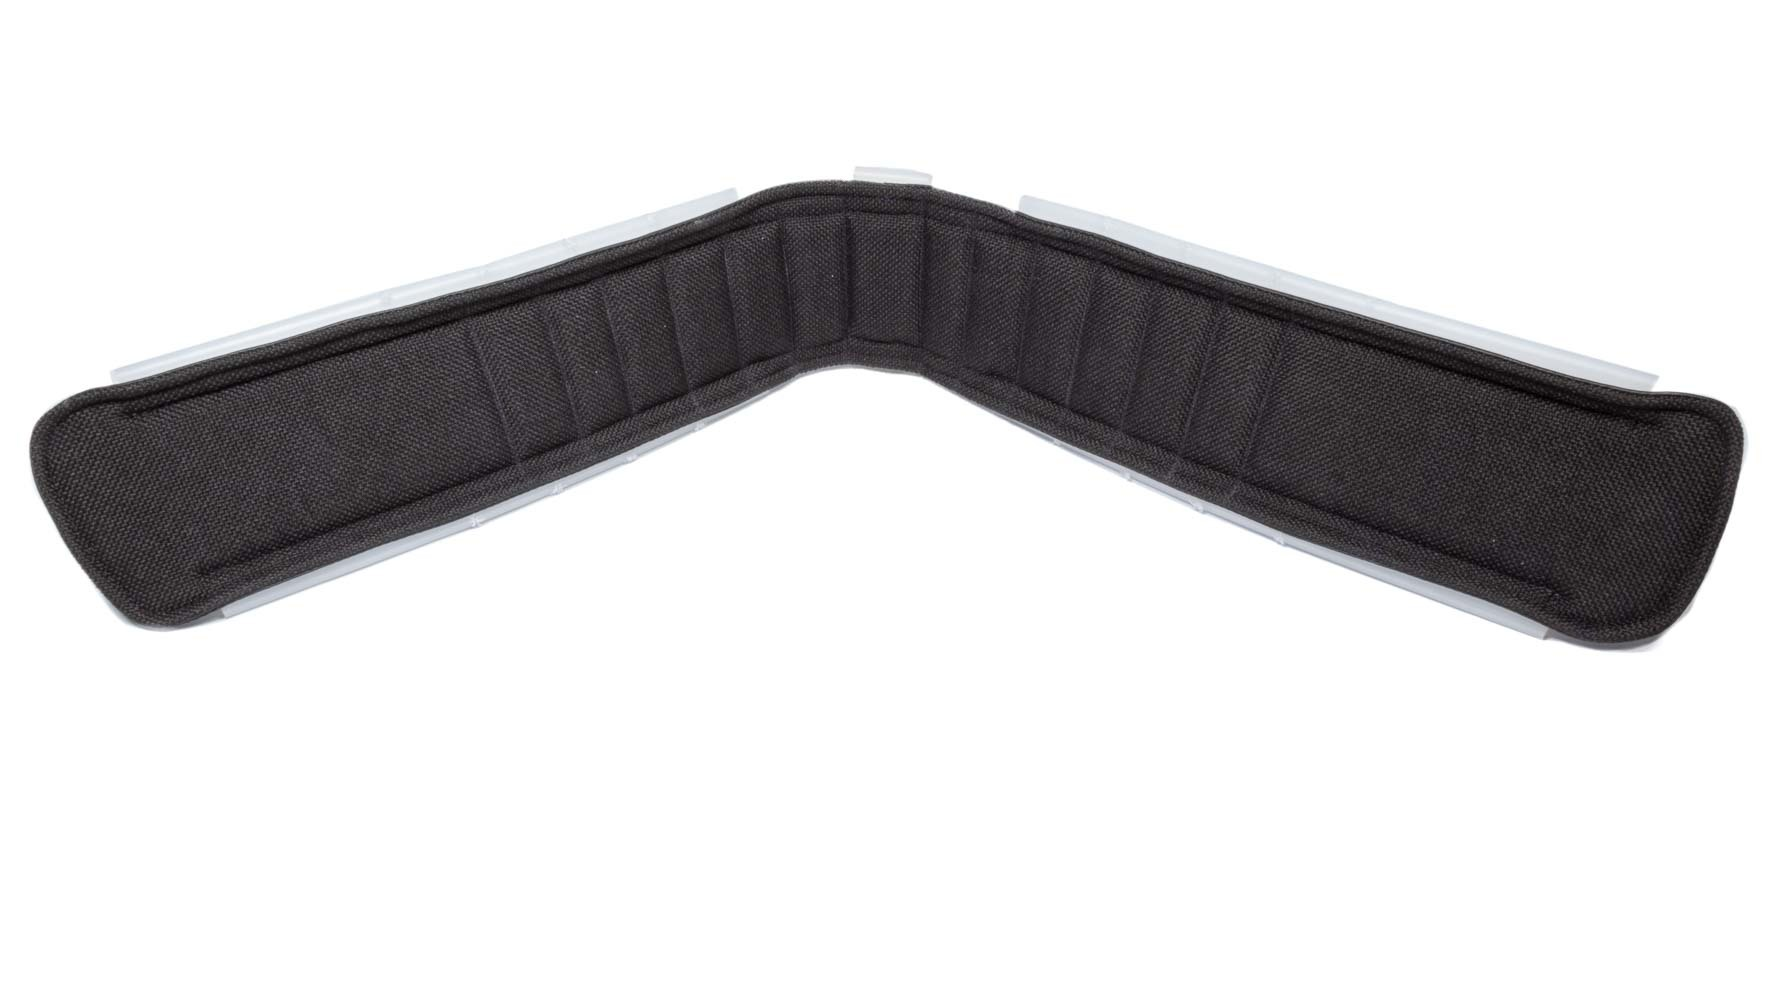 Ultra Shield 91081 Leg Protector Cover, Cloth, Black, Ultrashield Knee Guard, Each